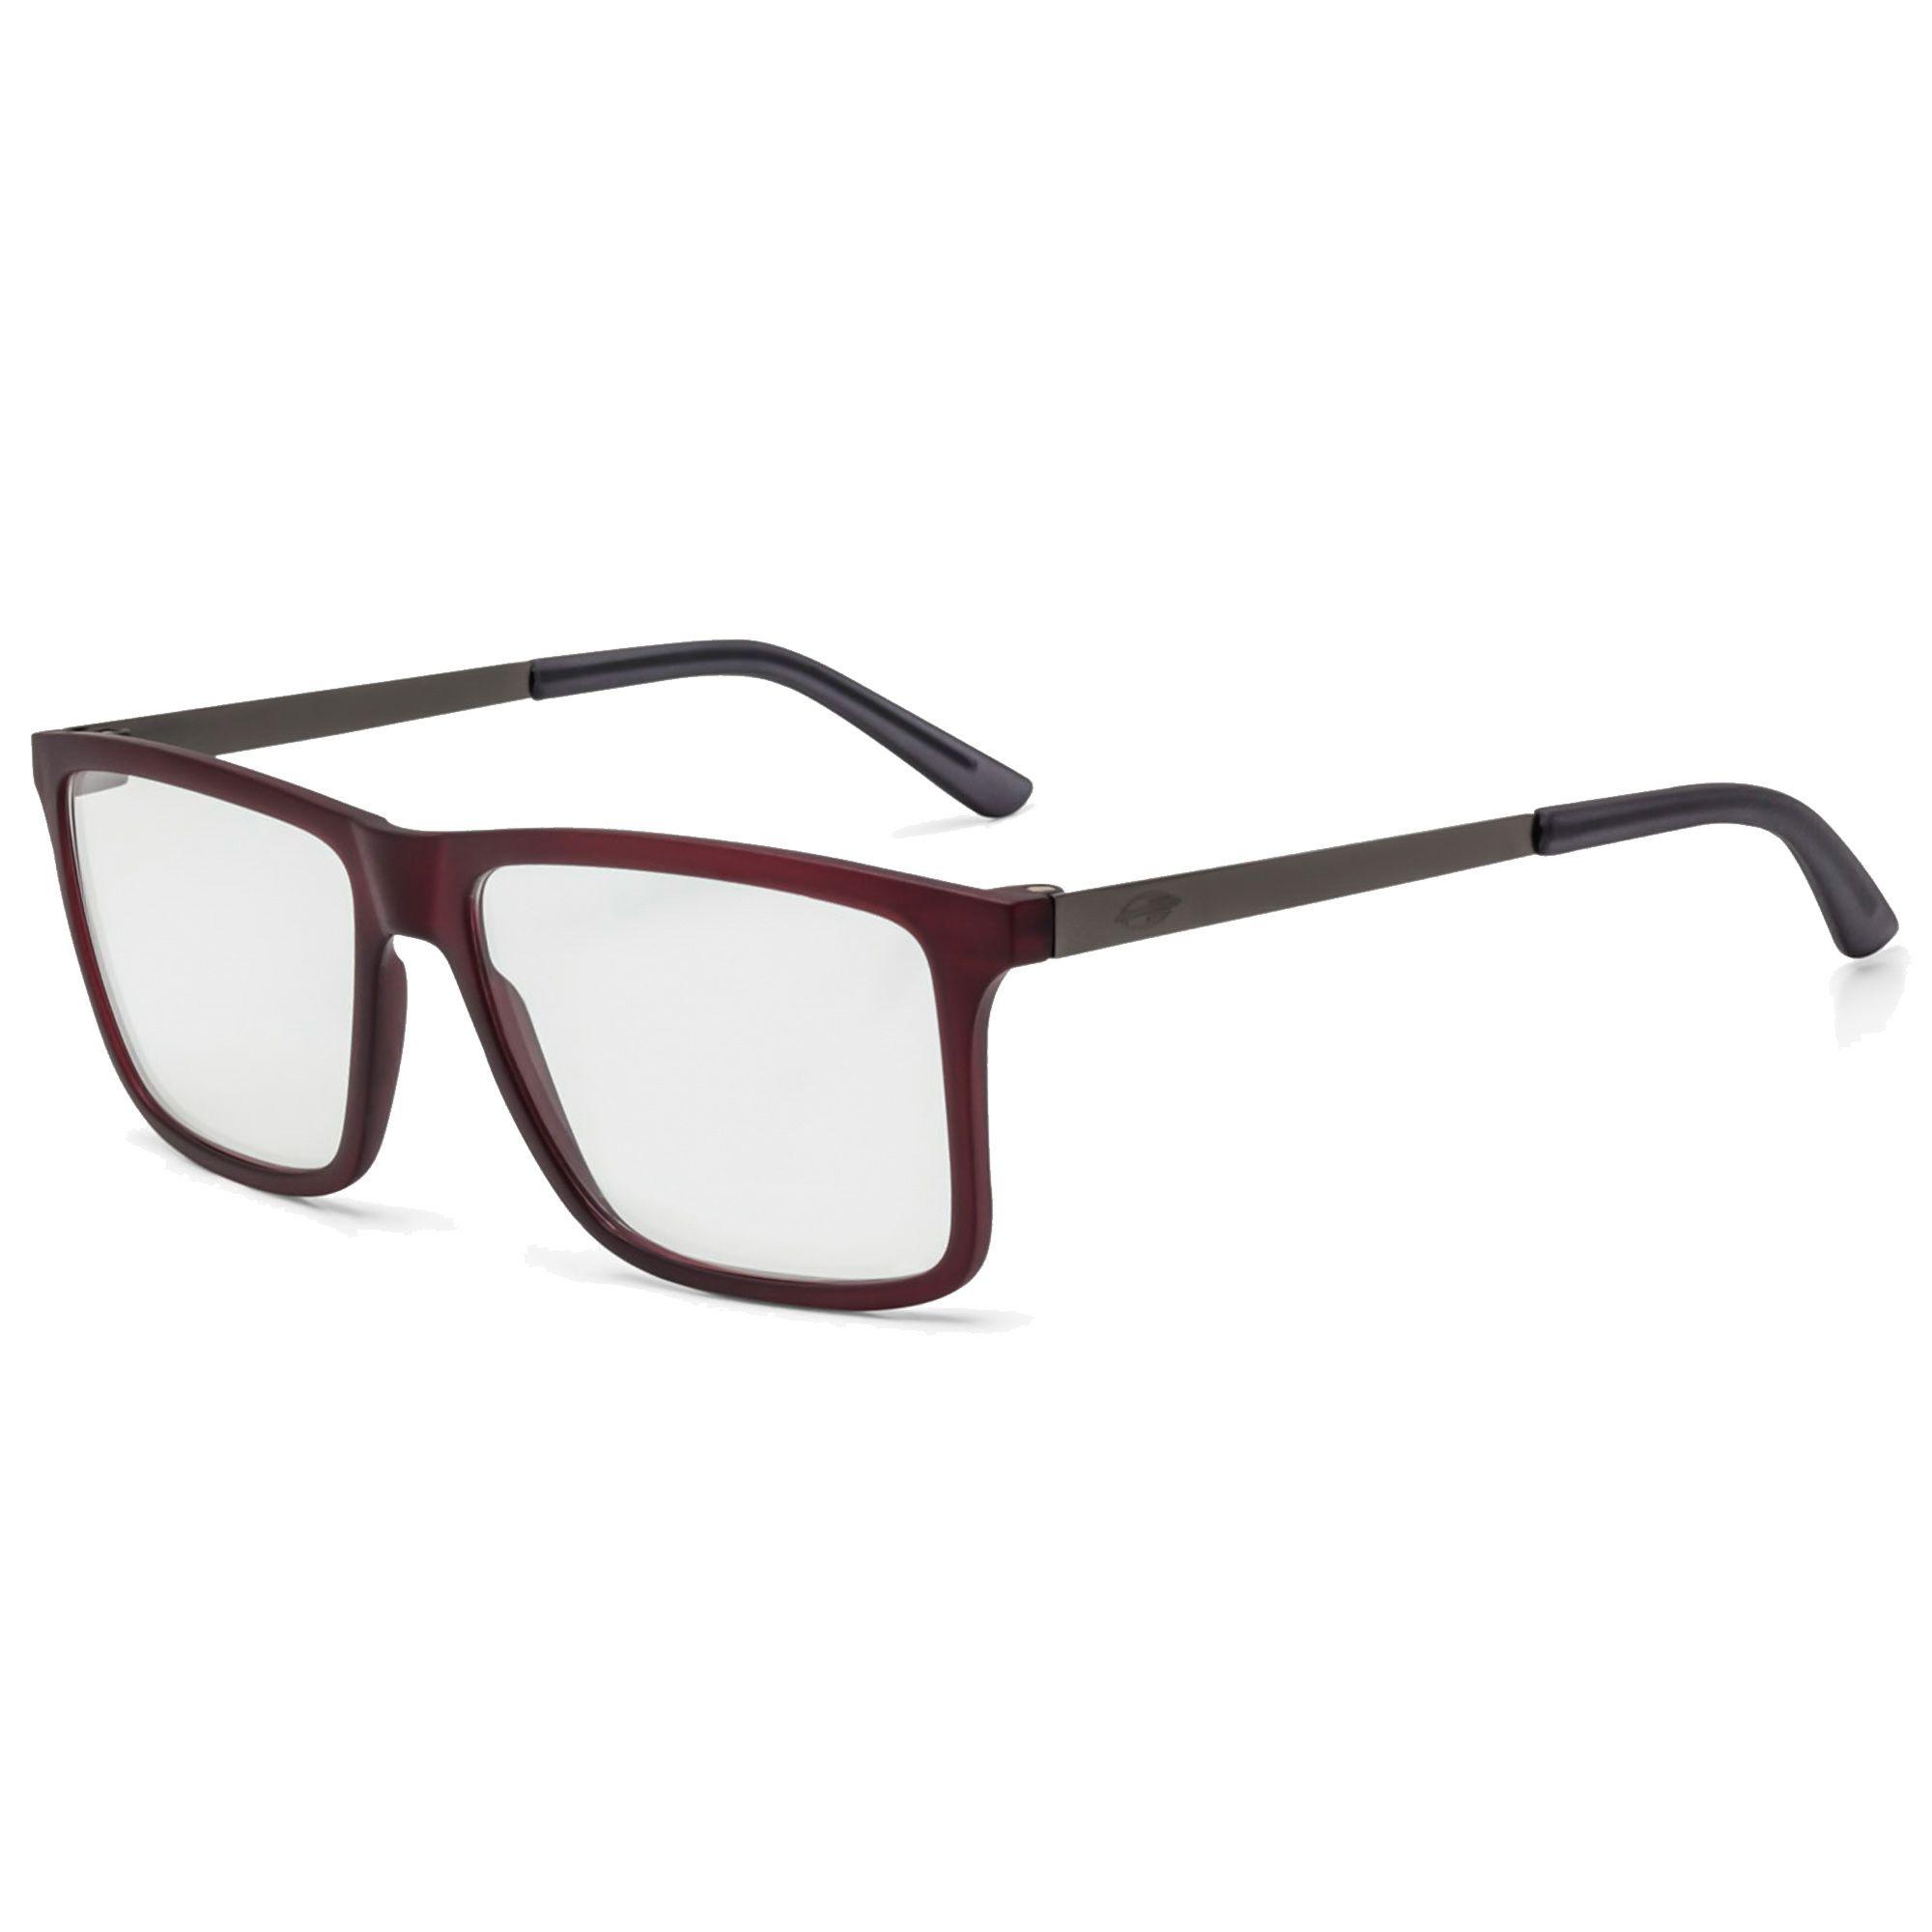 Óculos de Grau Unissex Mormaii Khapa M6045C3856